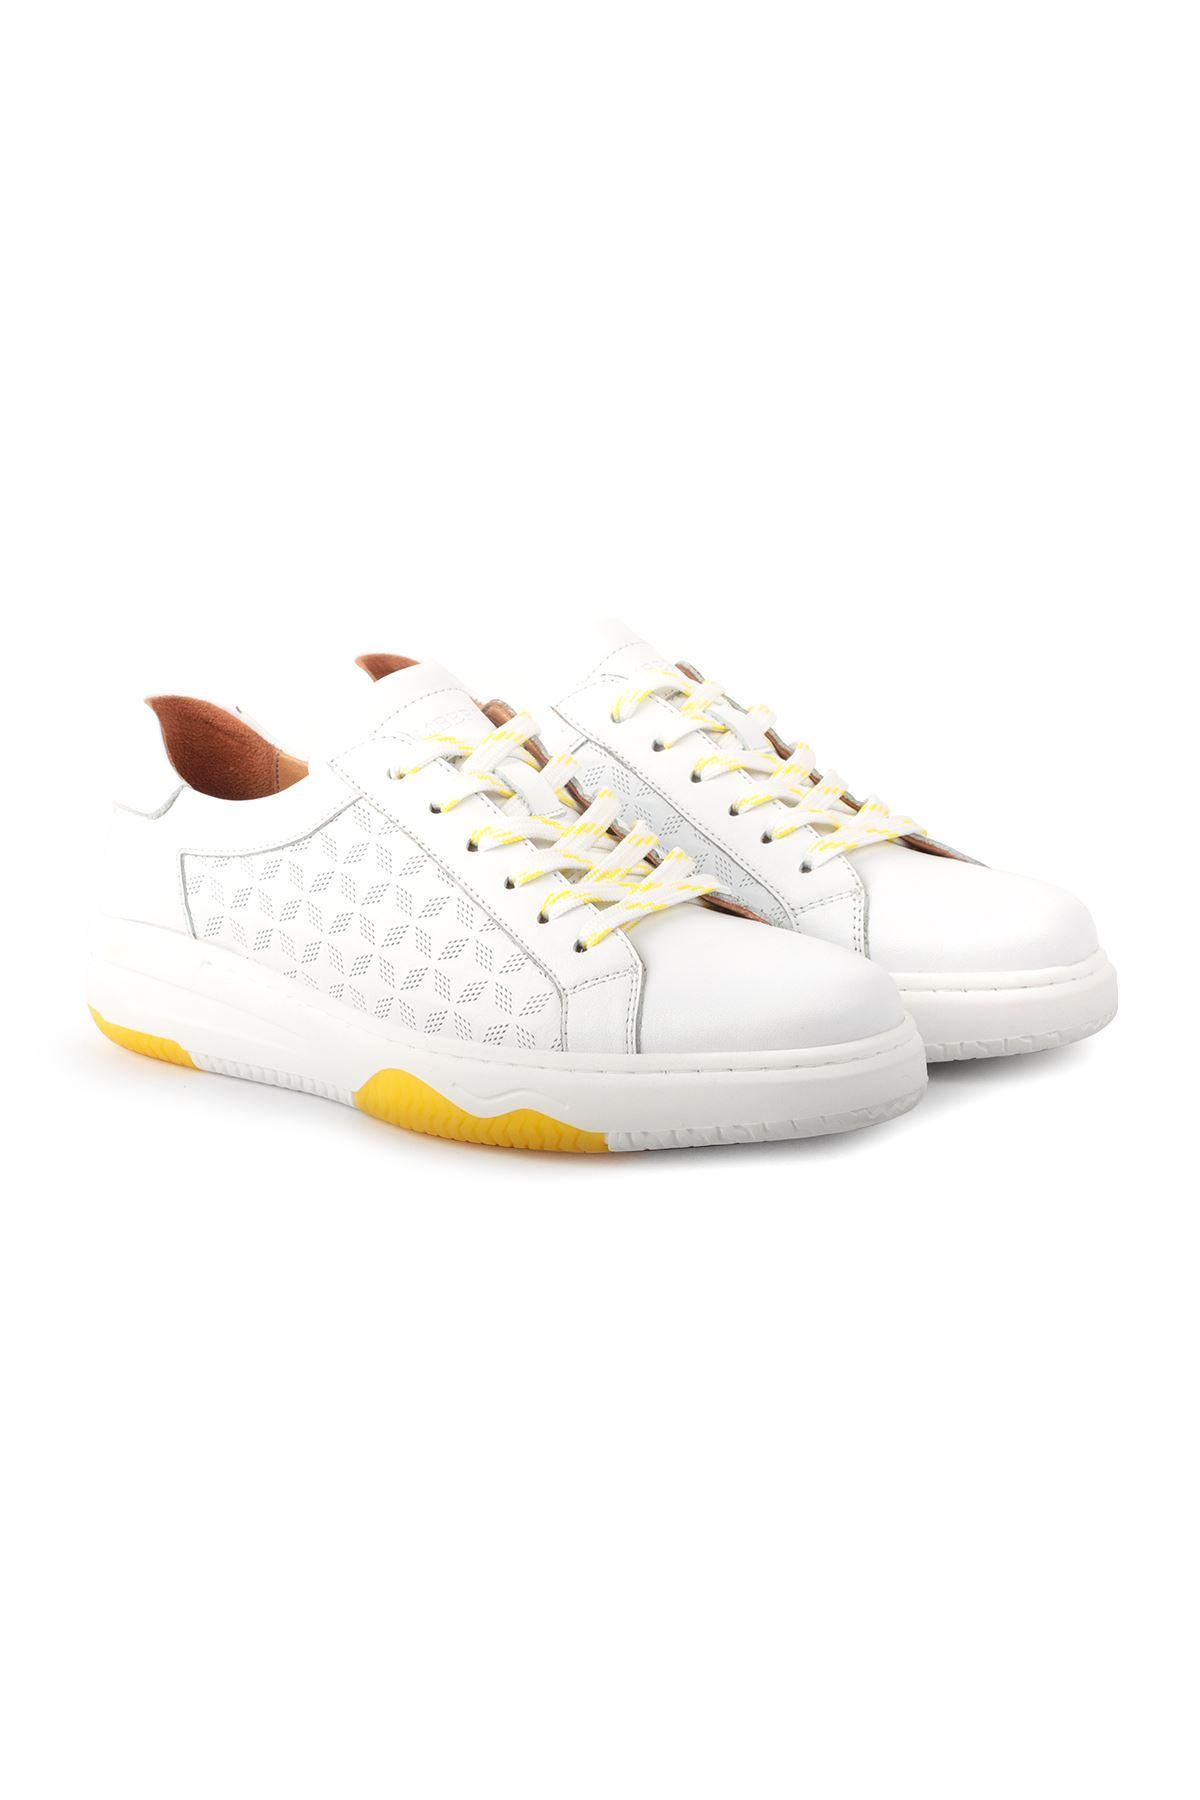 Libero L3751 White Casual Men Shoes